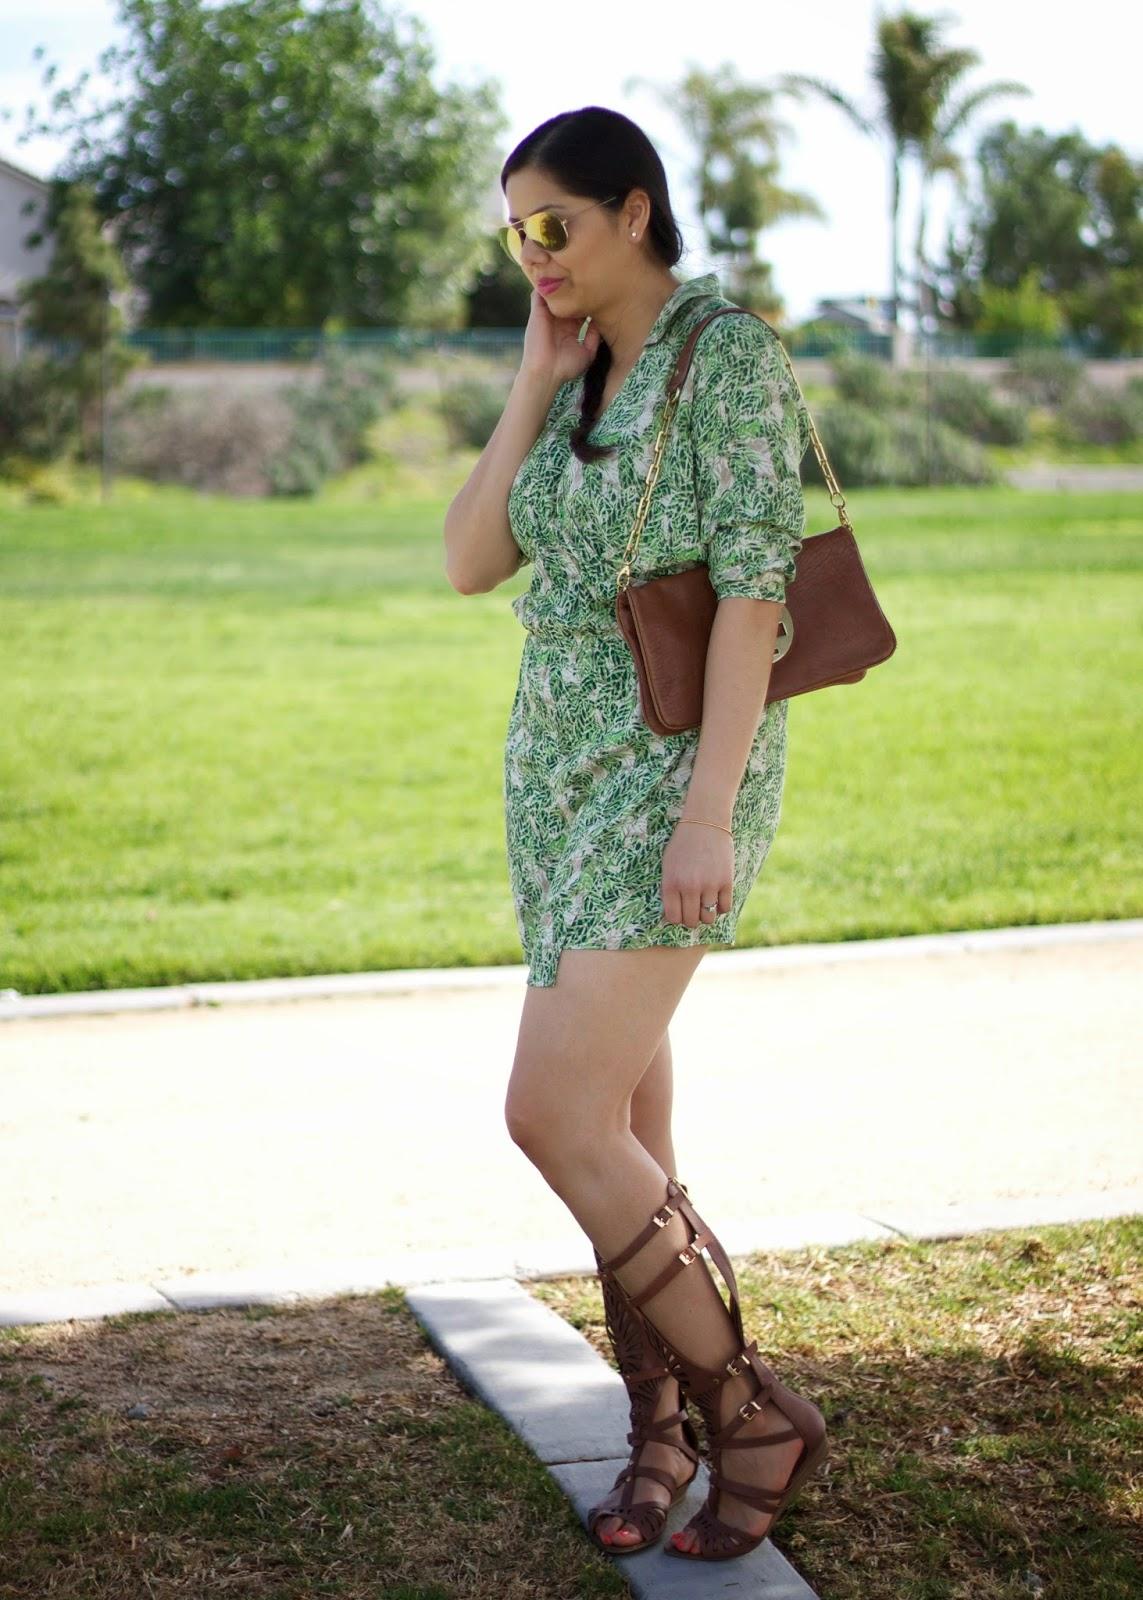 Justfab blogger, justfab cisera sandals, justfab fashion blogger, buckled gladiator sandals, affordable shoes on justfab